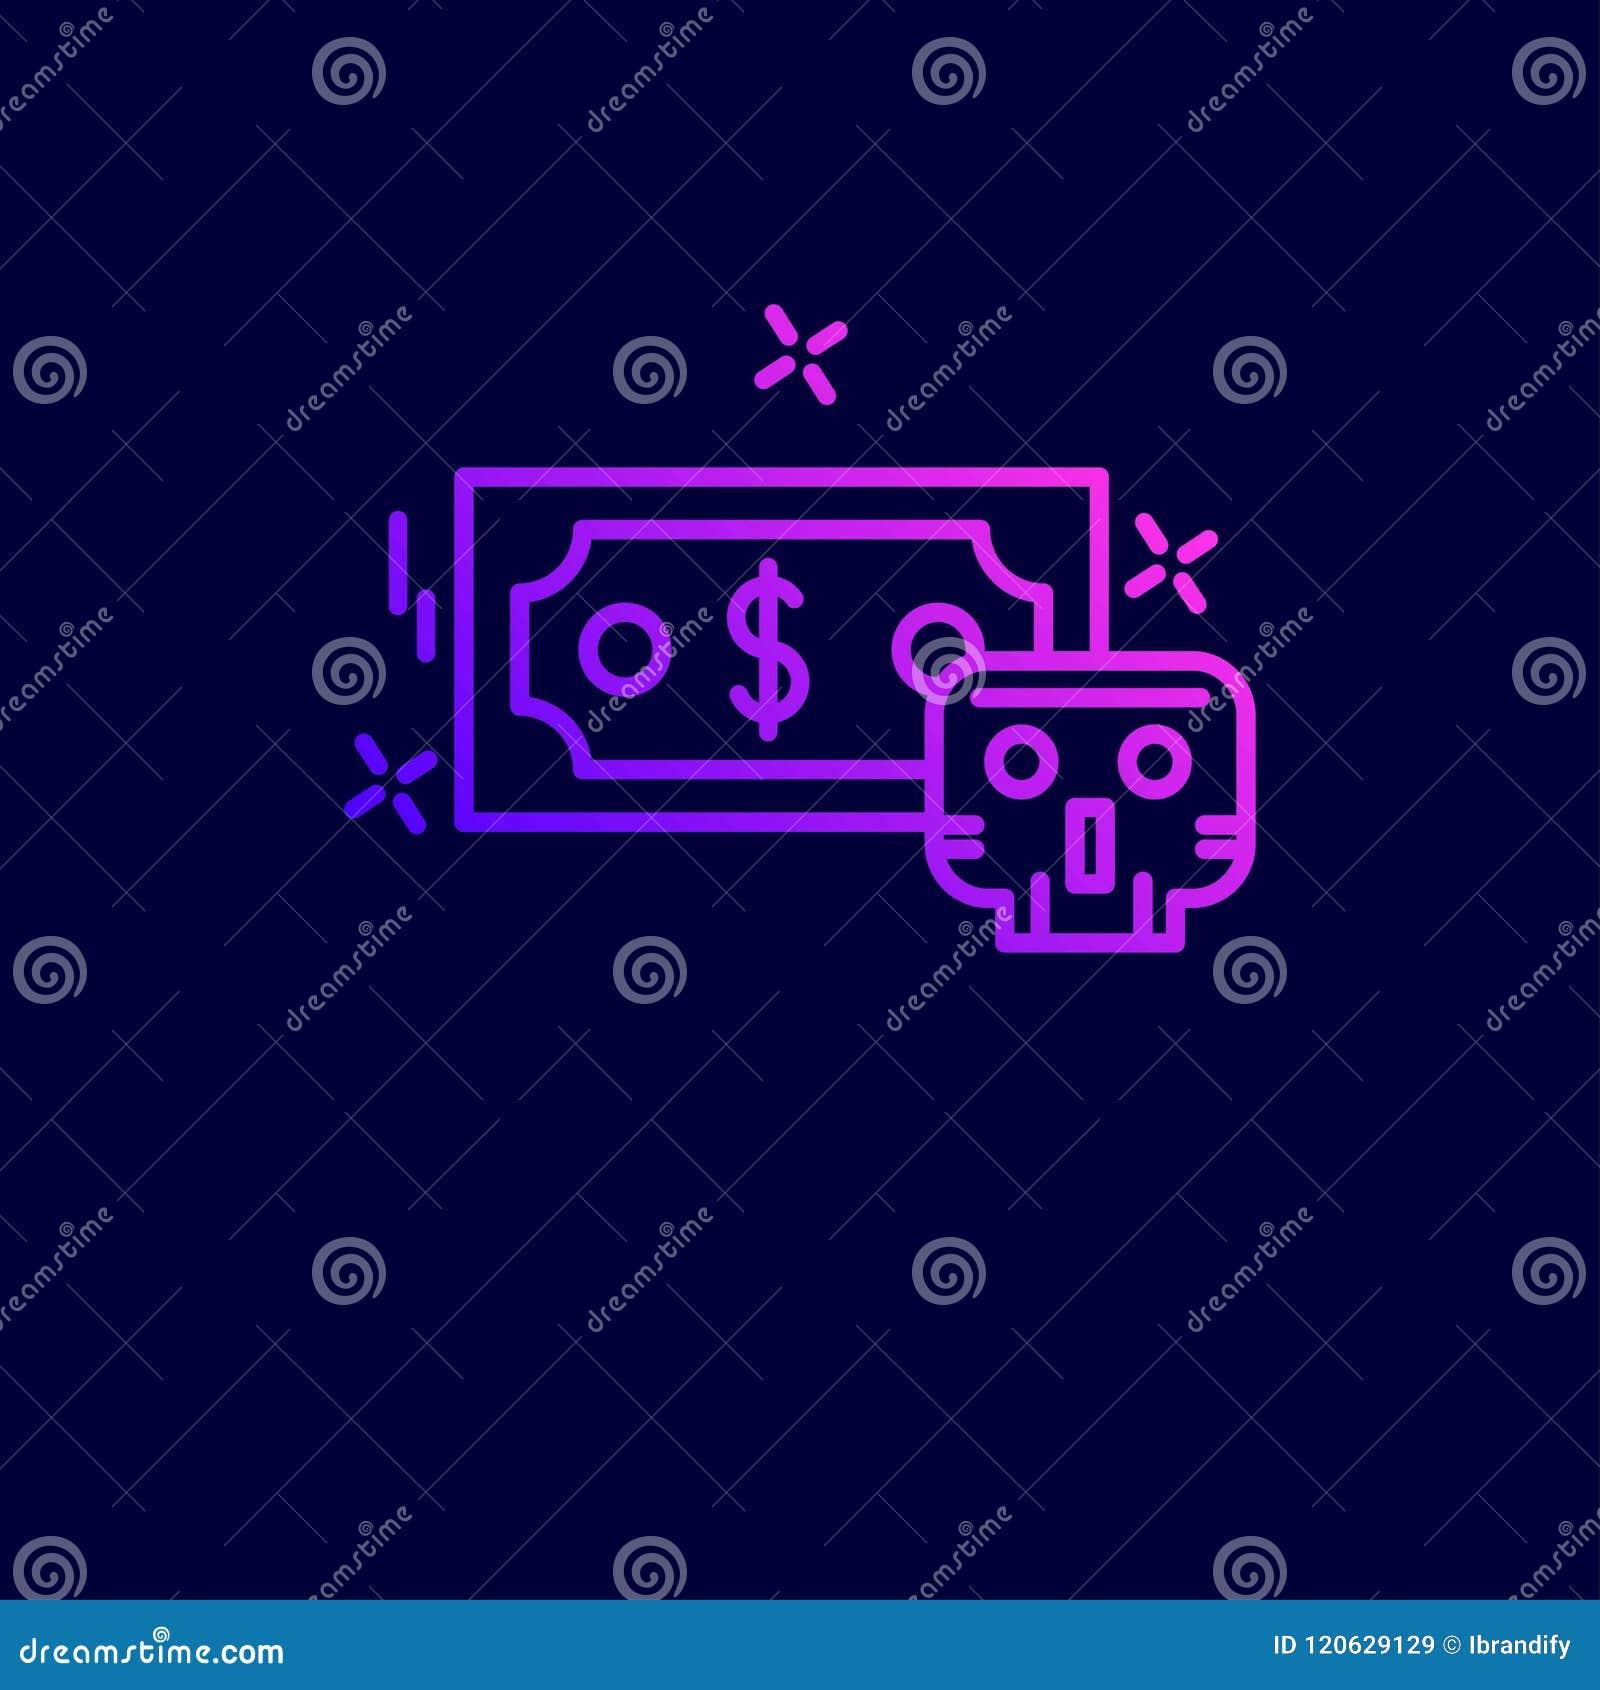 Neon Online Login